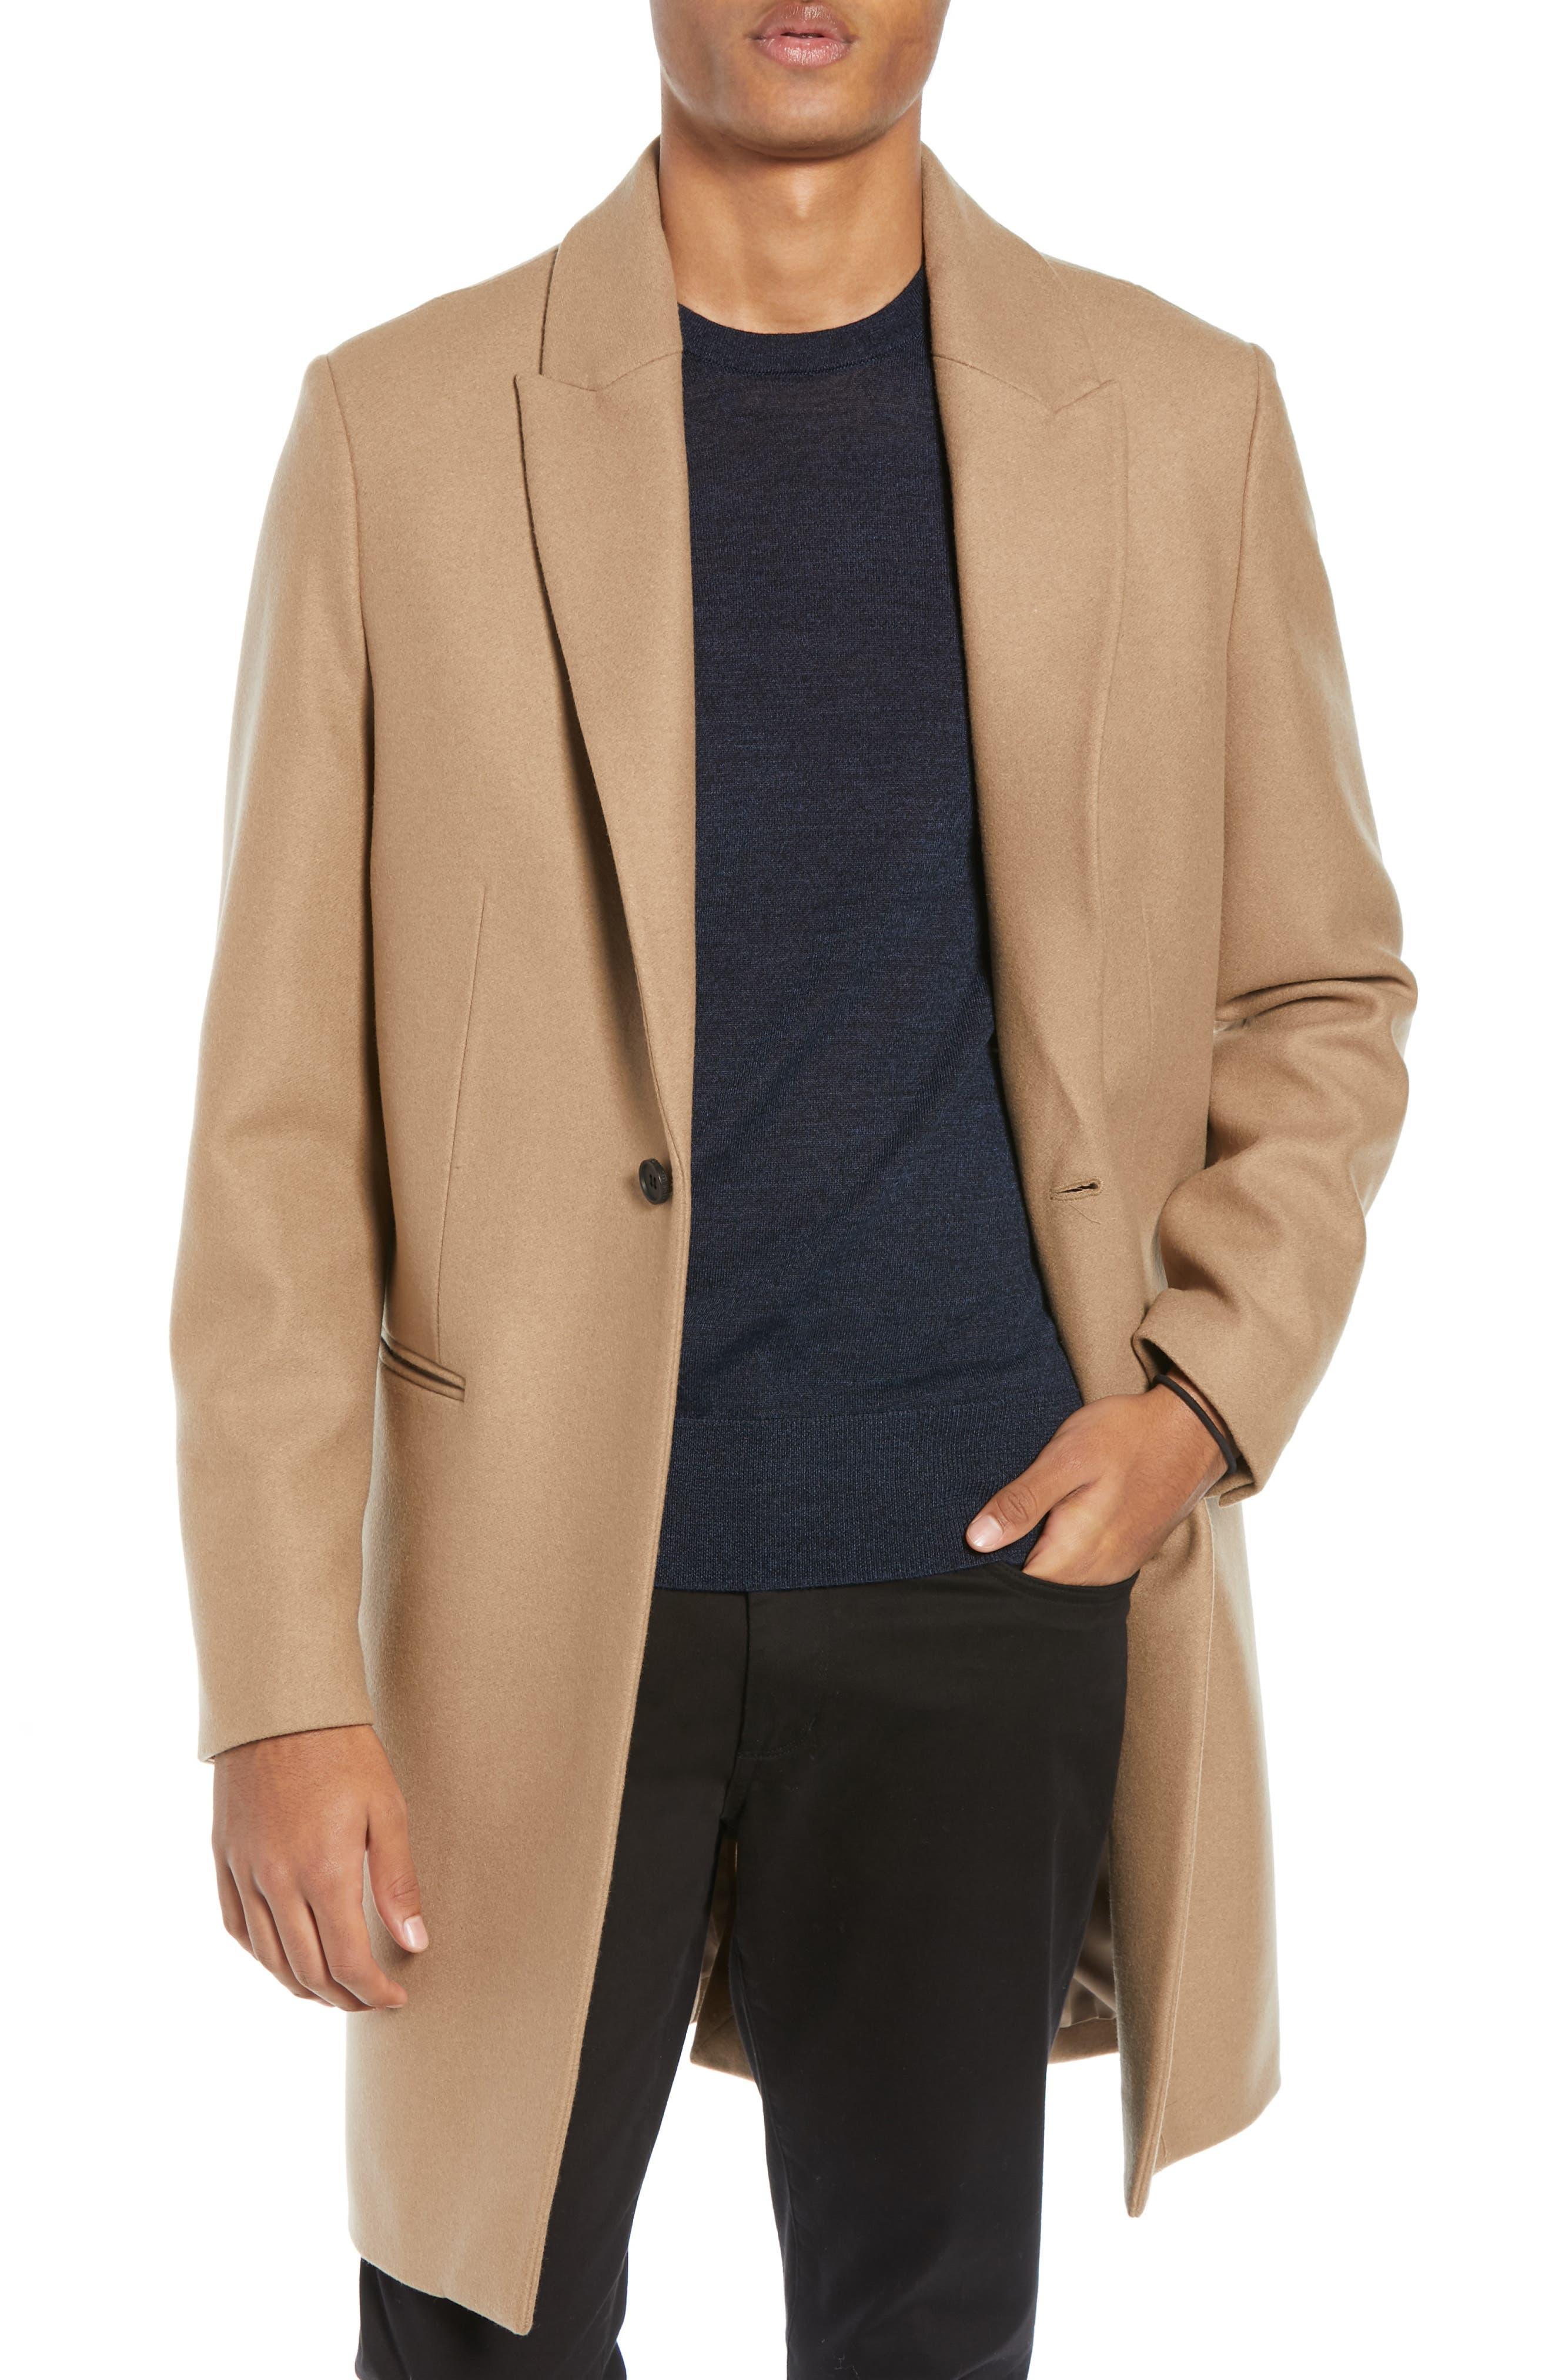 Tulsen Regular Fit Wool Topcoat,                             Main thumbnail 1, color,                             200